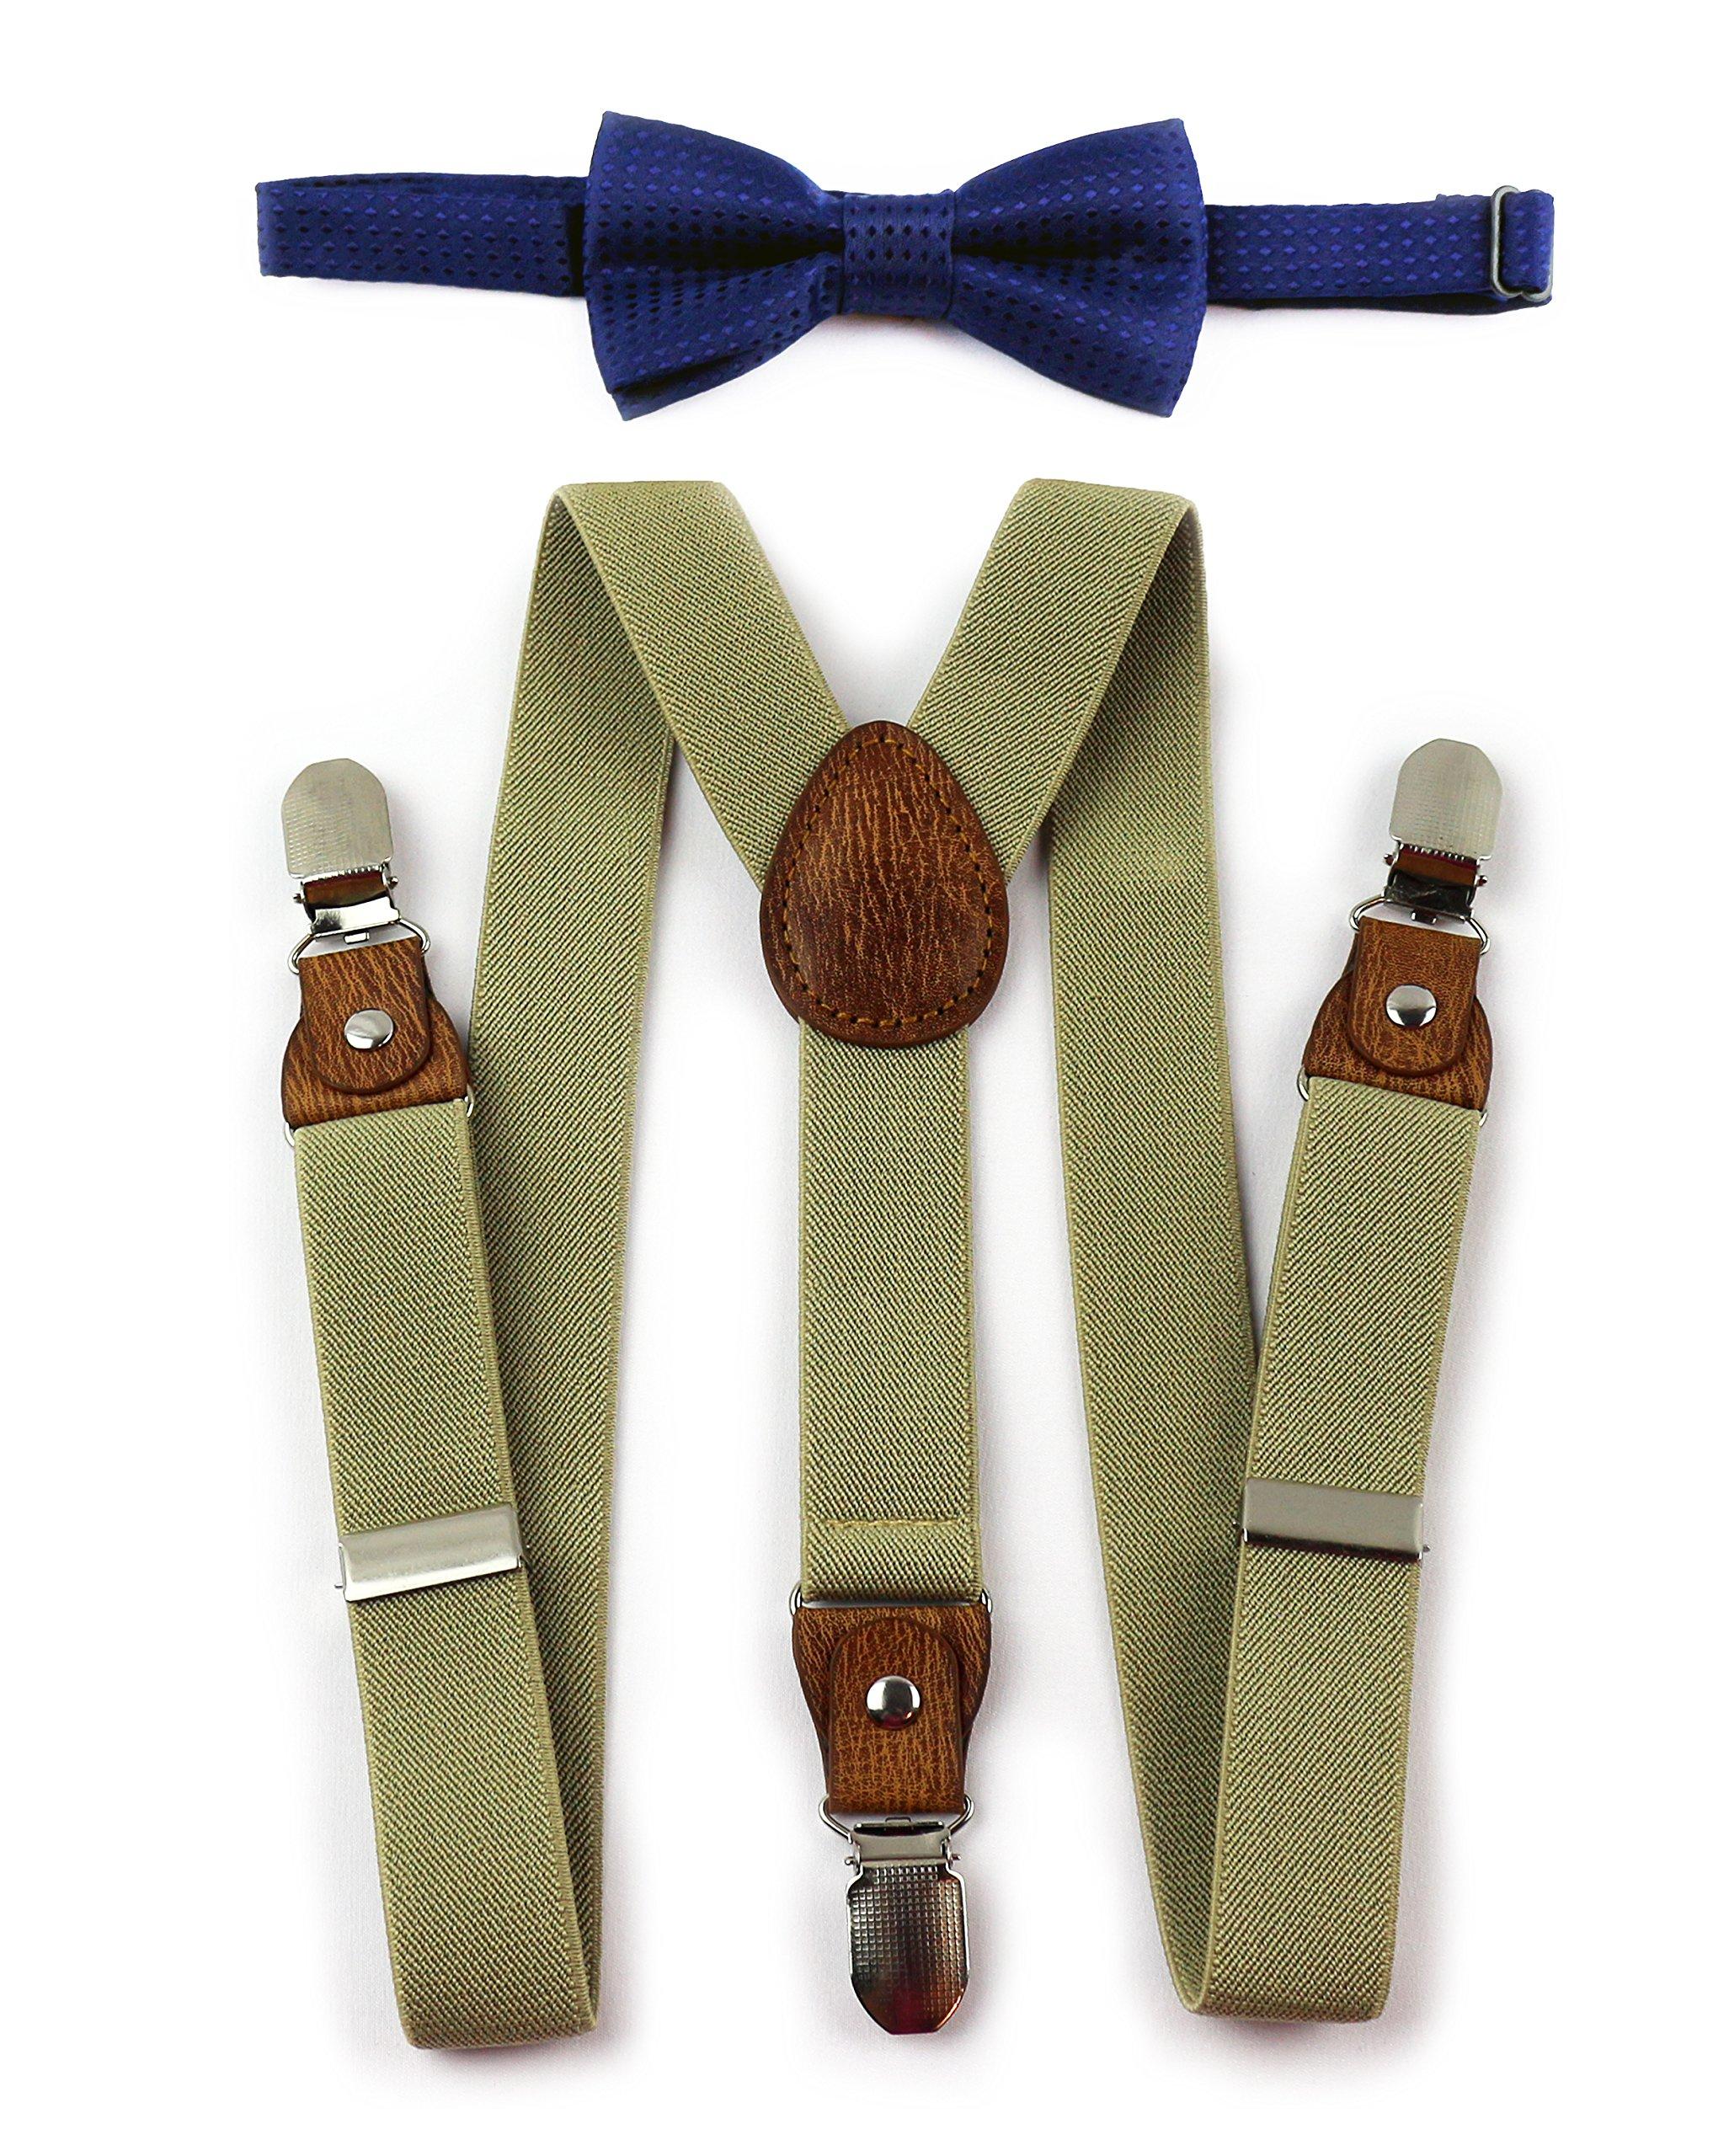 Kids Suspenders Bow Tie (Tan Khaki Suspenders and Navy Blue Bow)